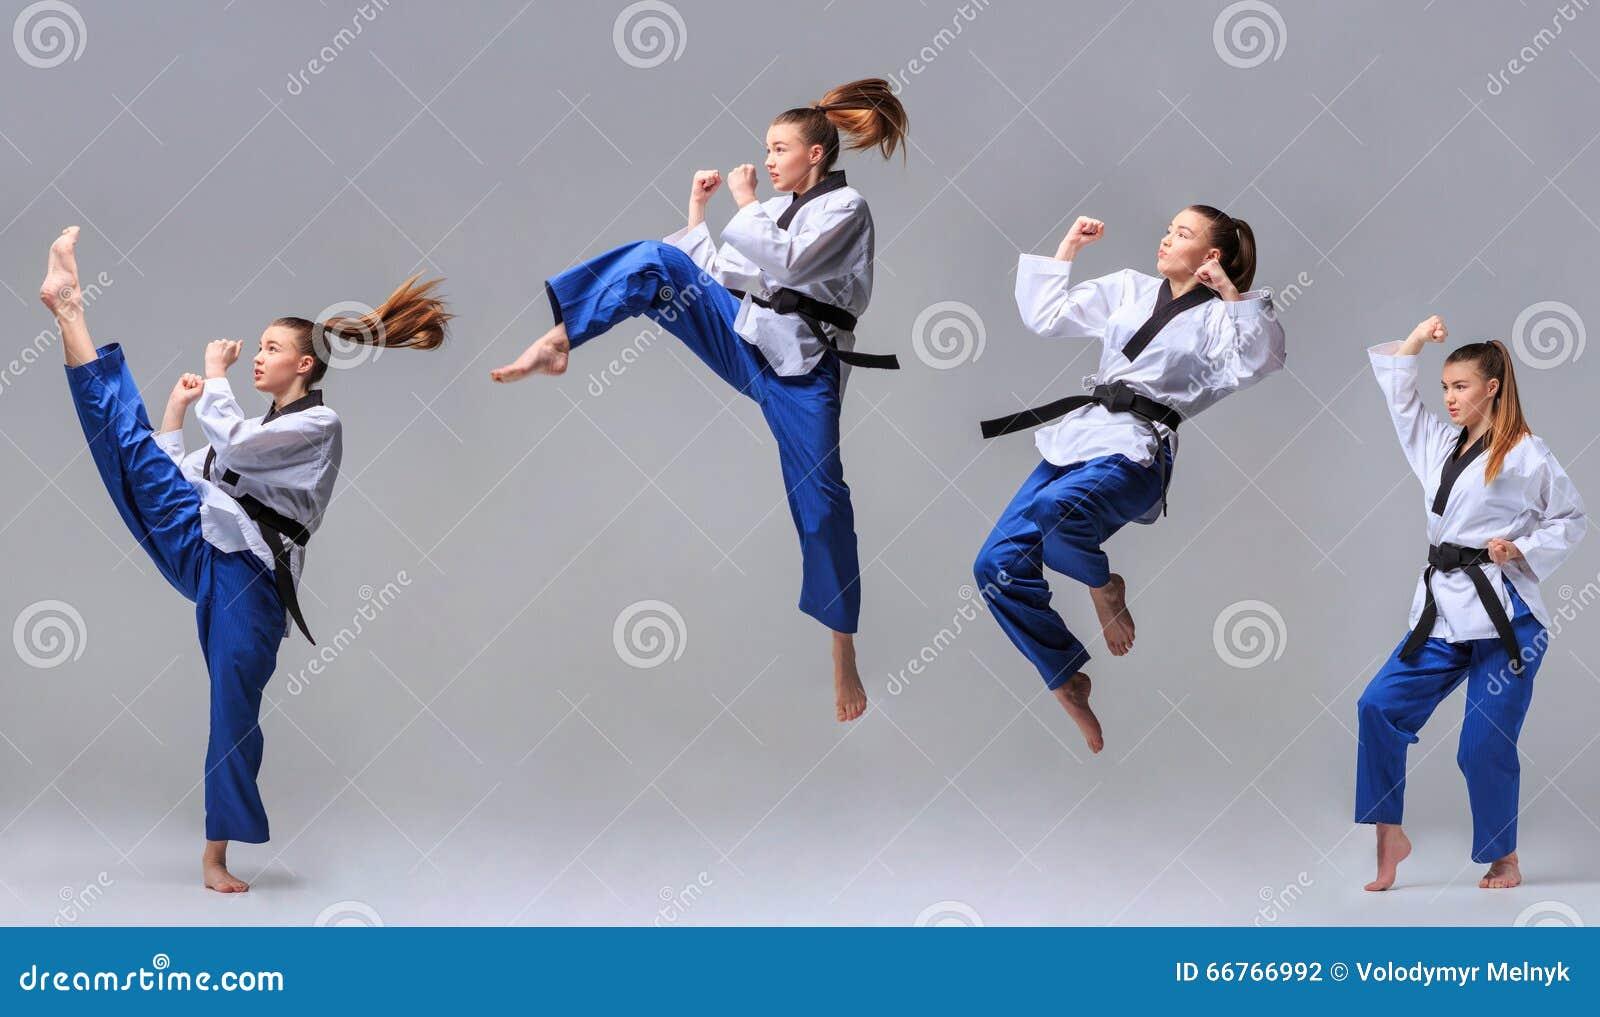 Kimono for karate. How to choose and buy 1